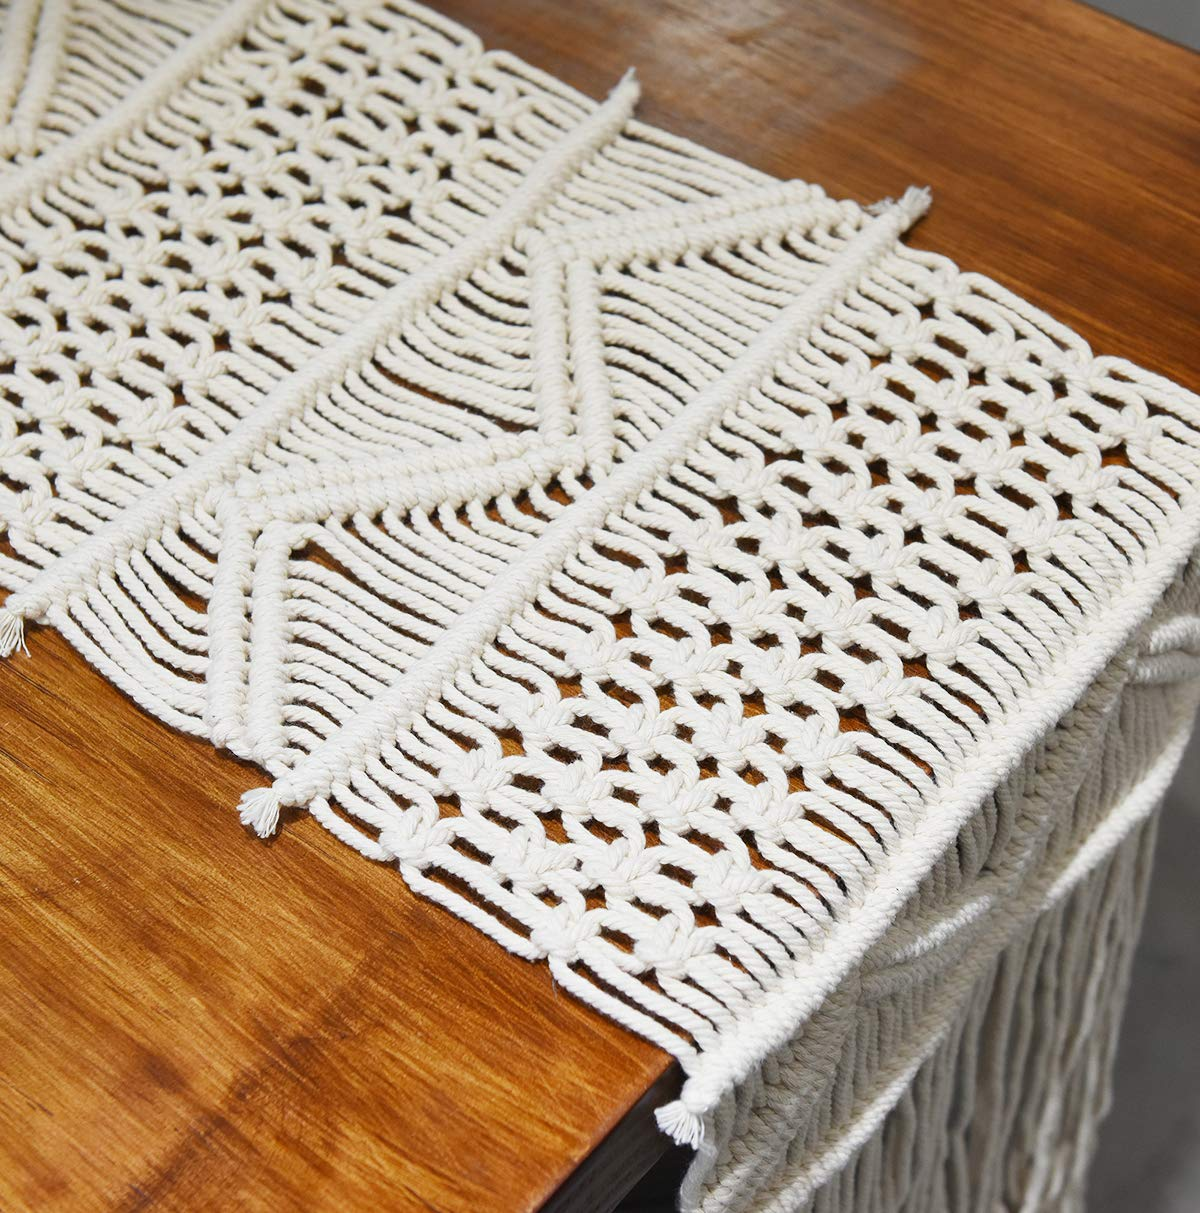 Flber Macrame Table Runners Handwoven Boho Wedding Table Decoration Bedding Blanket,13.8''x 94'' (13.8''x 94'')